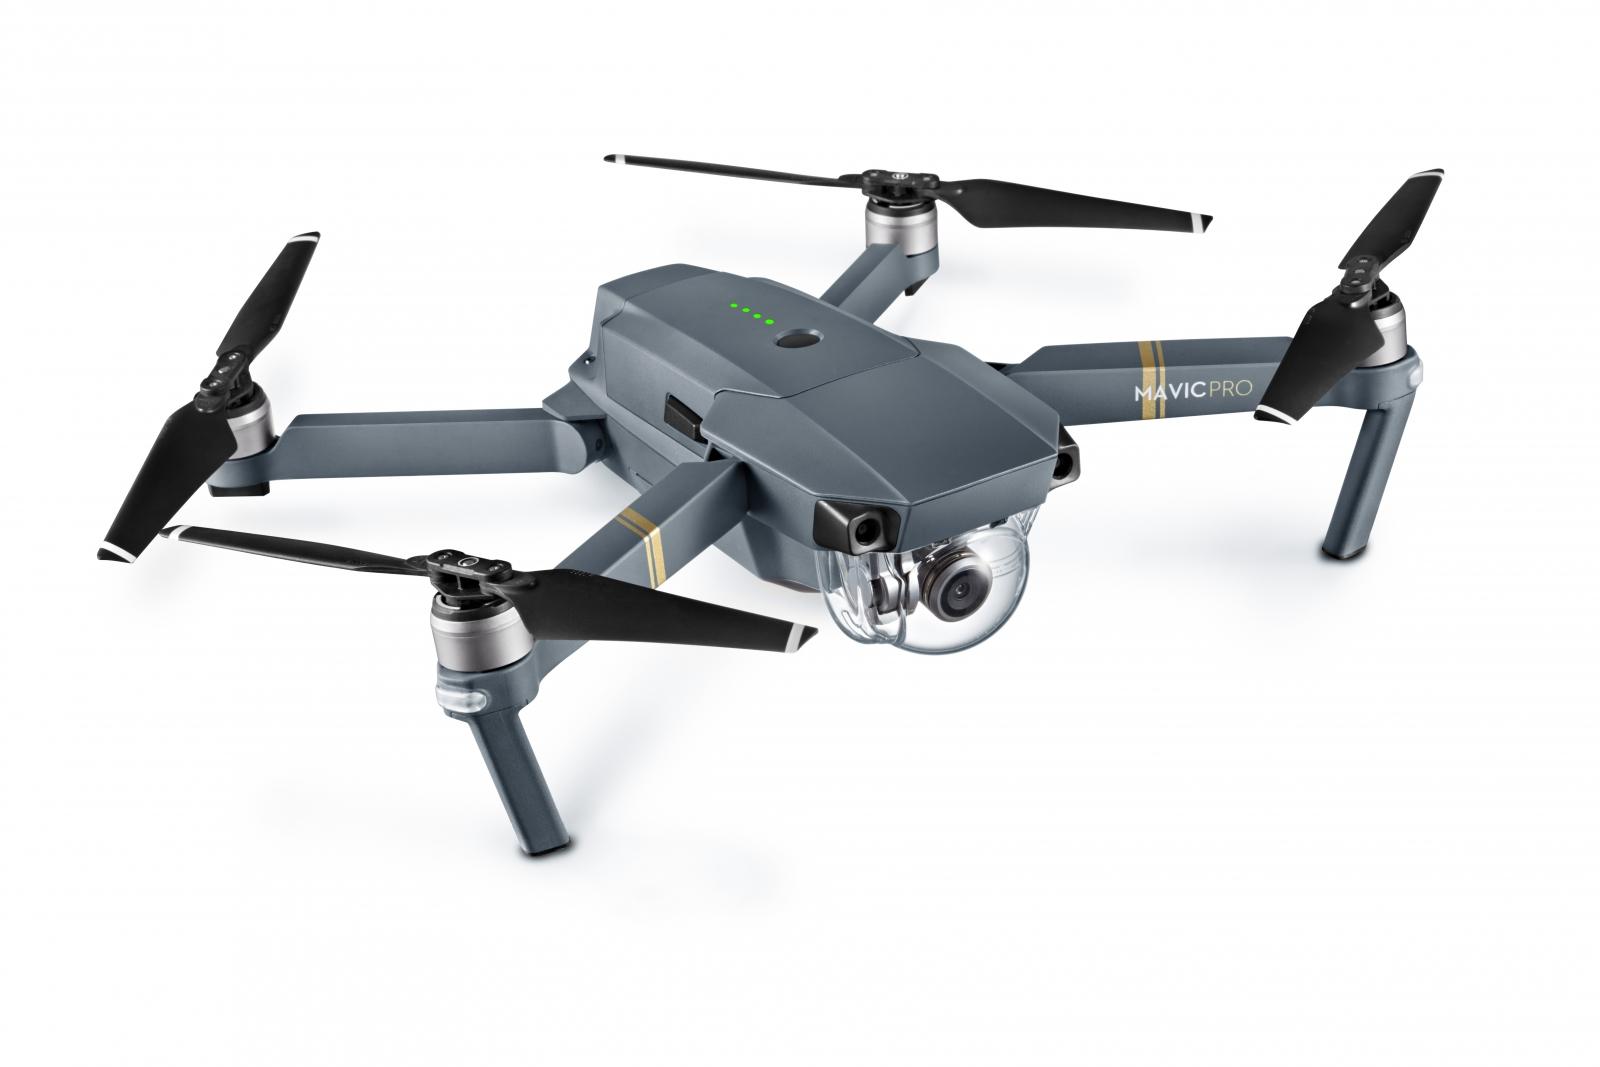 DJI's Mavic Pro foldable selfie drone